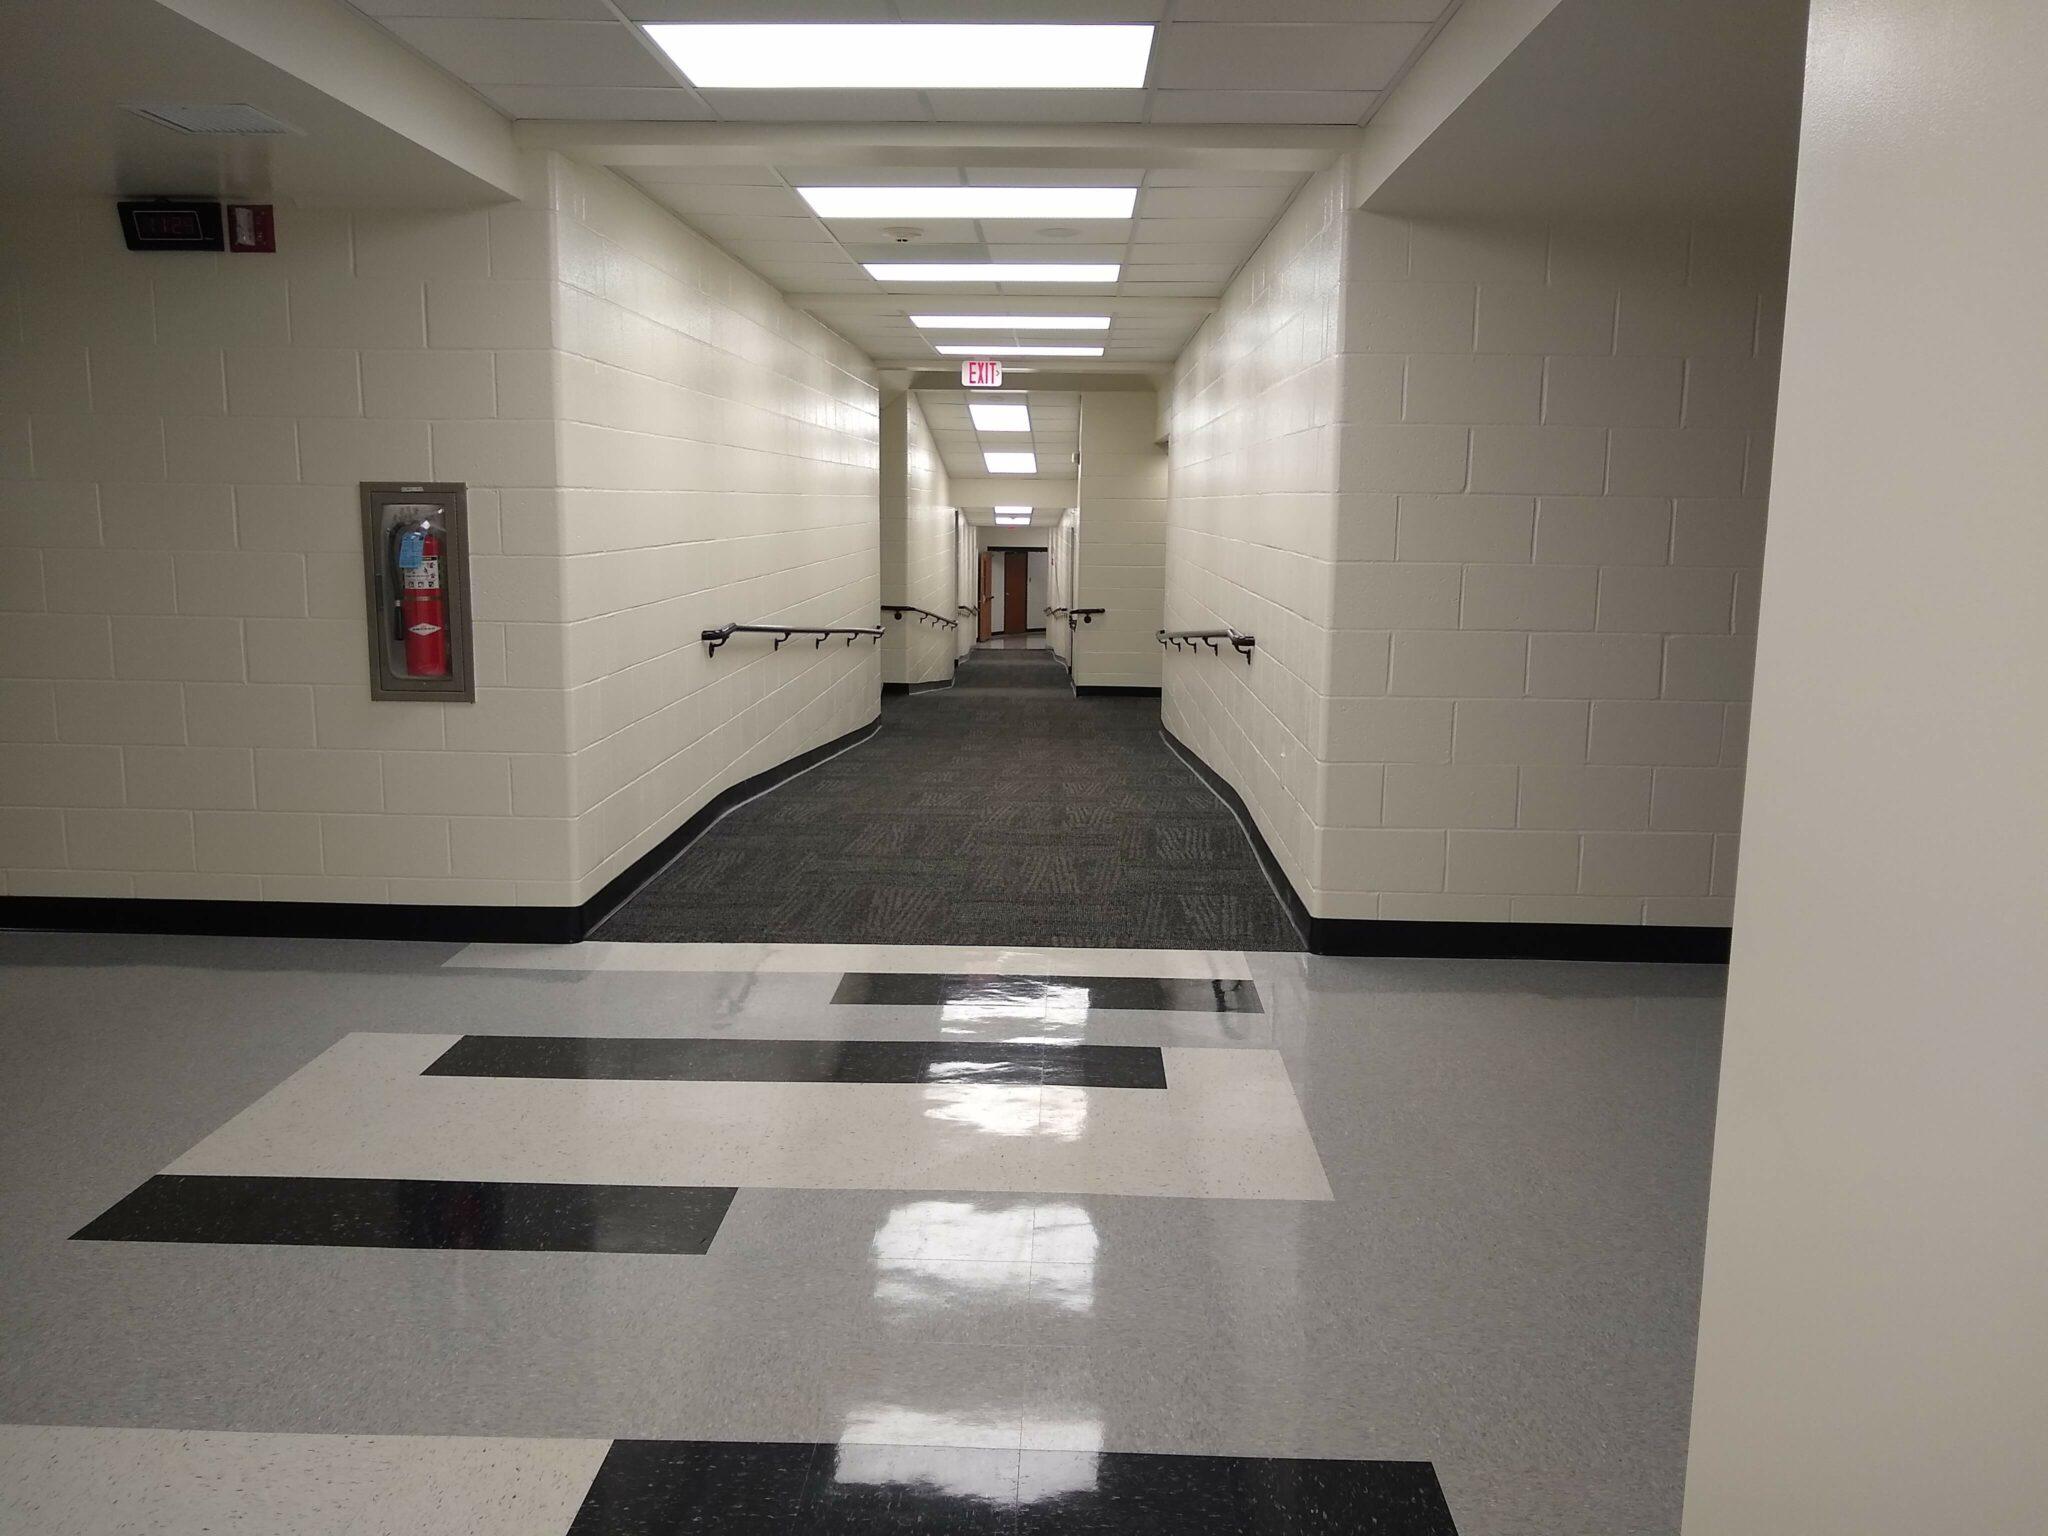 new floors hs ms area